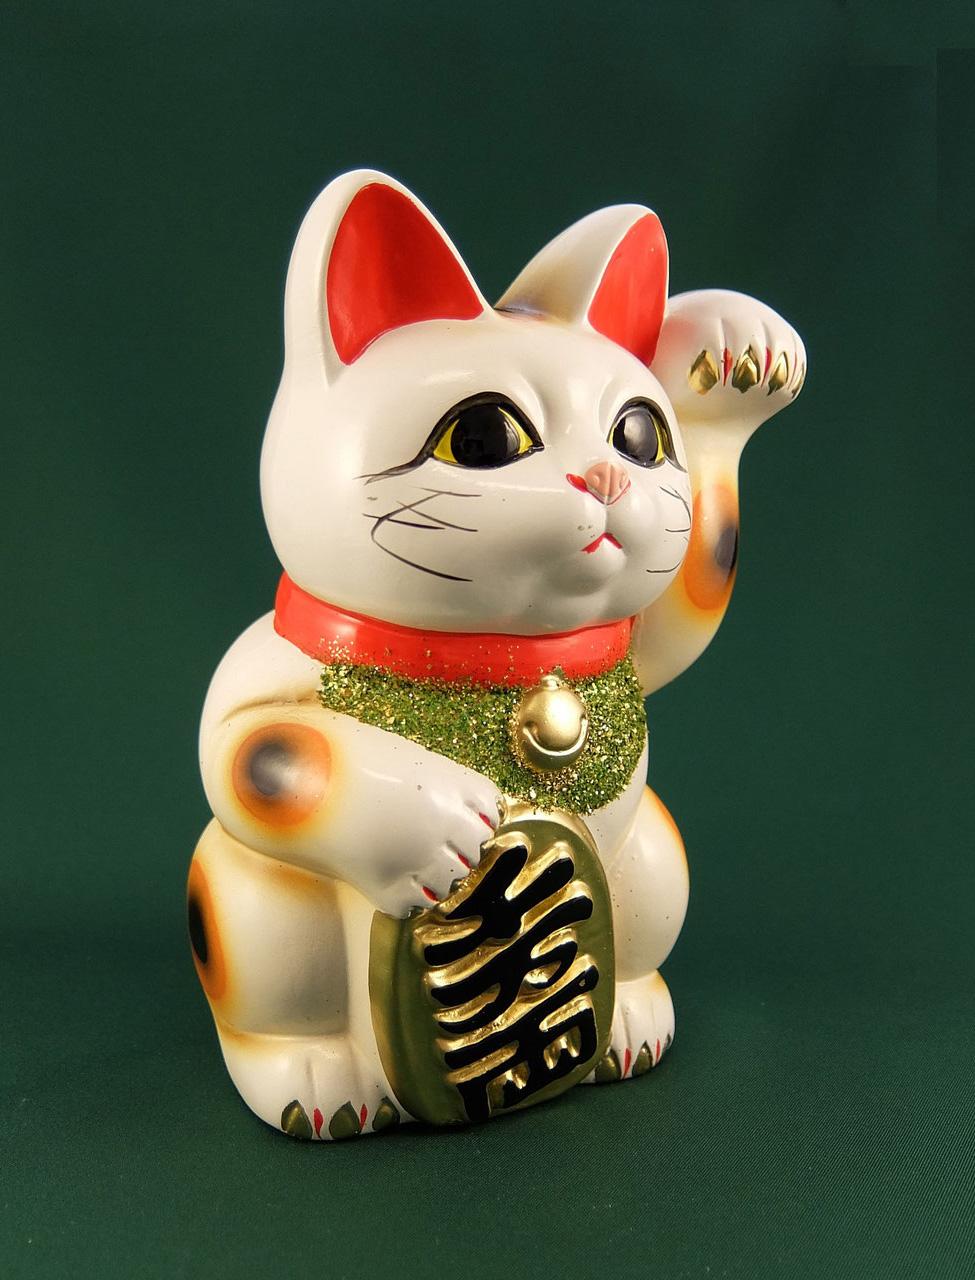 Maneki neko, il gatto portafortuna giapponese